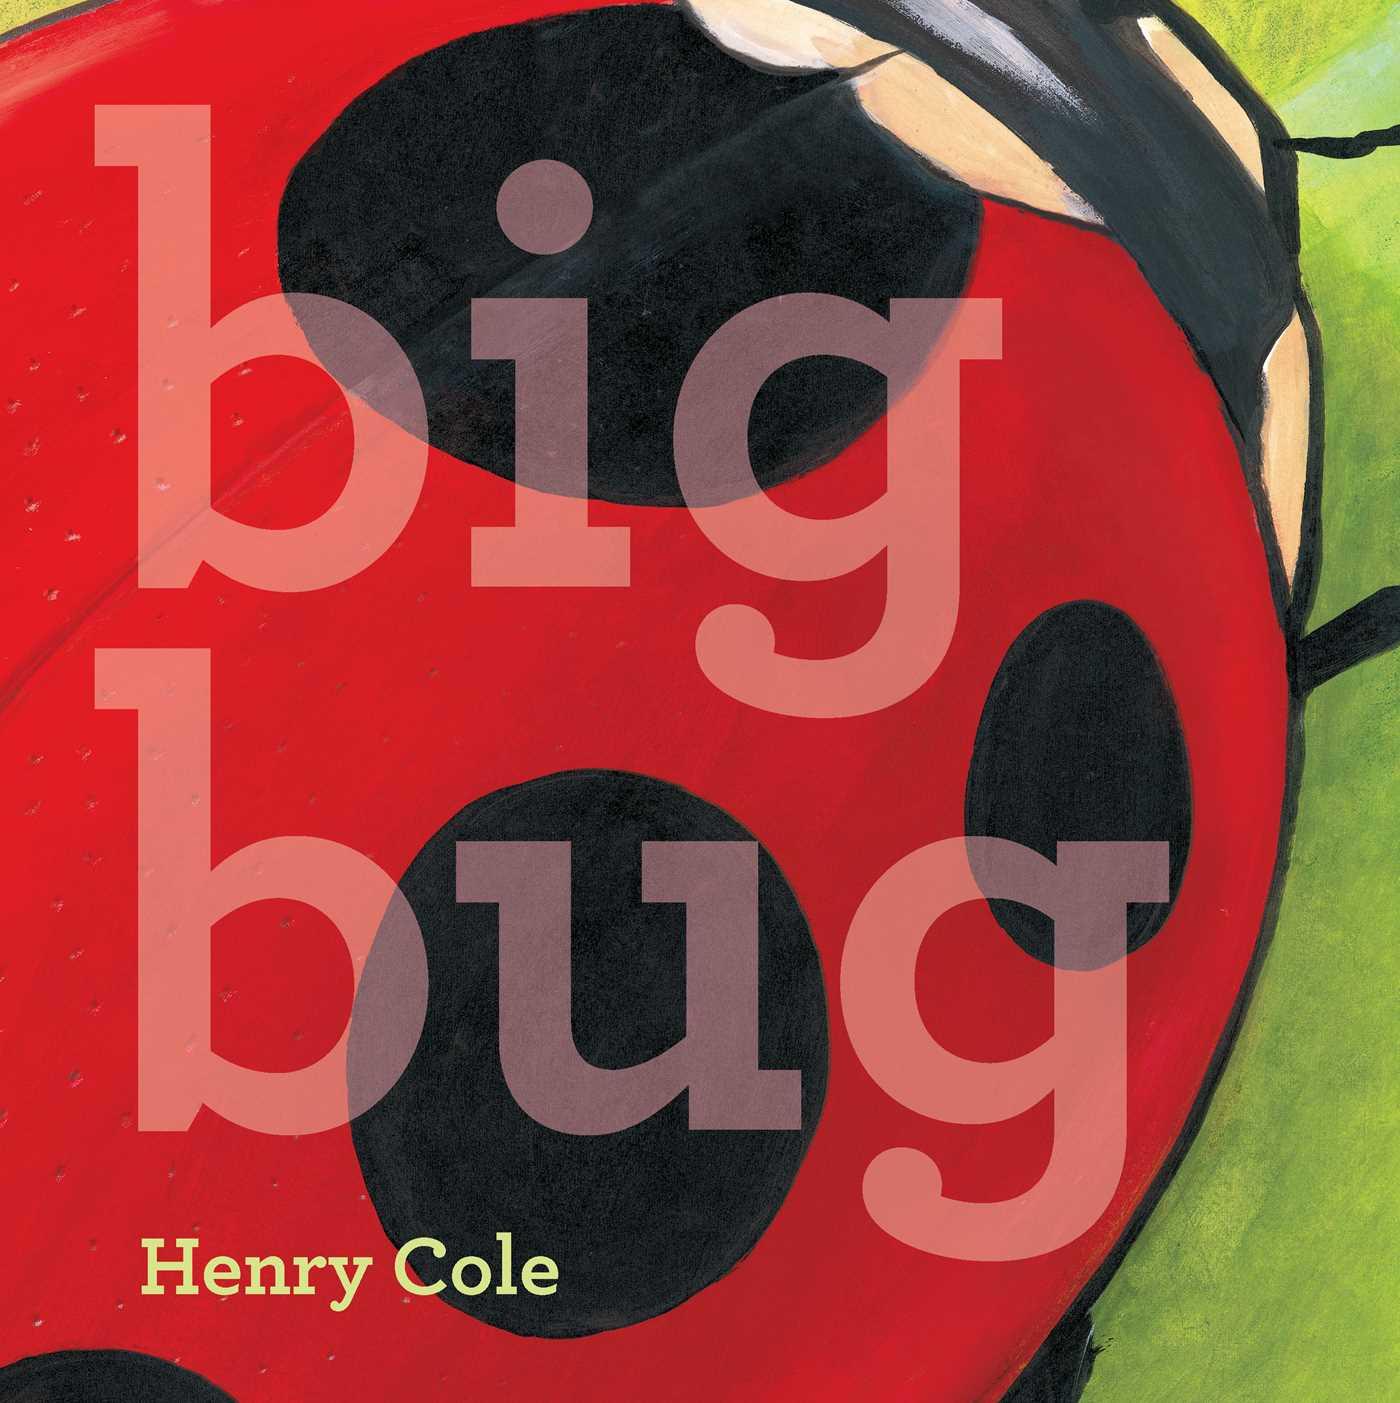 Big bug 9781442498976 hr